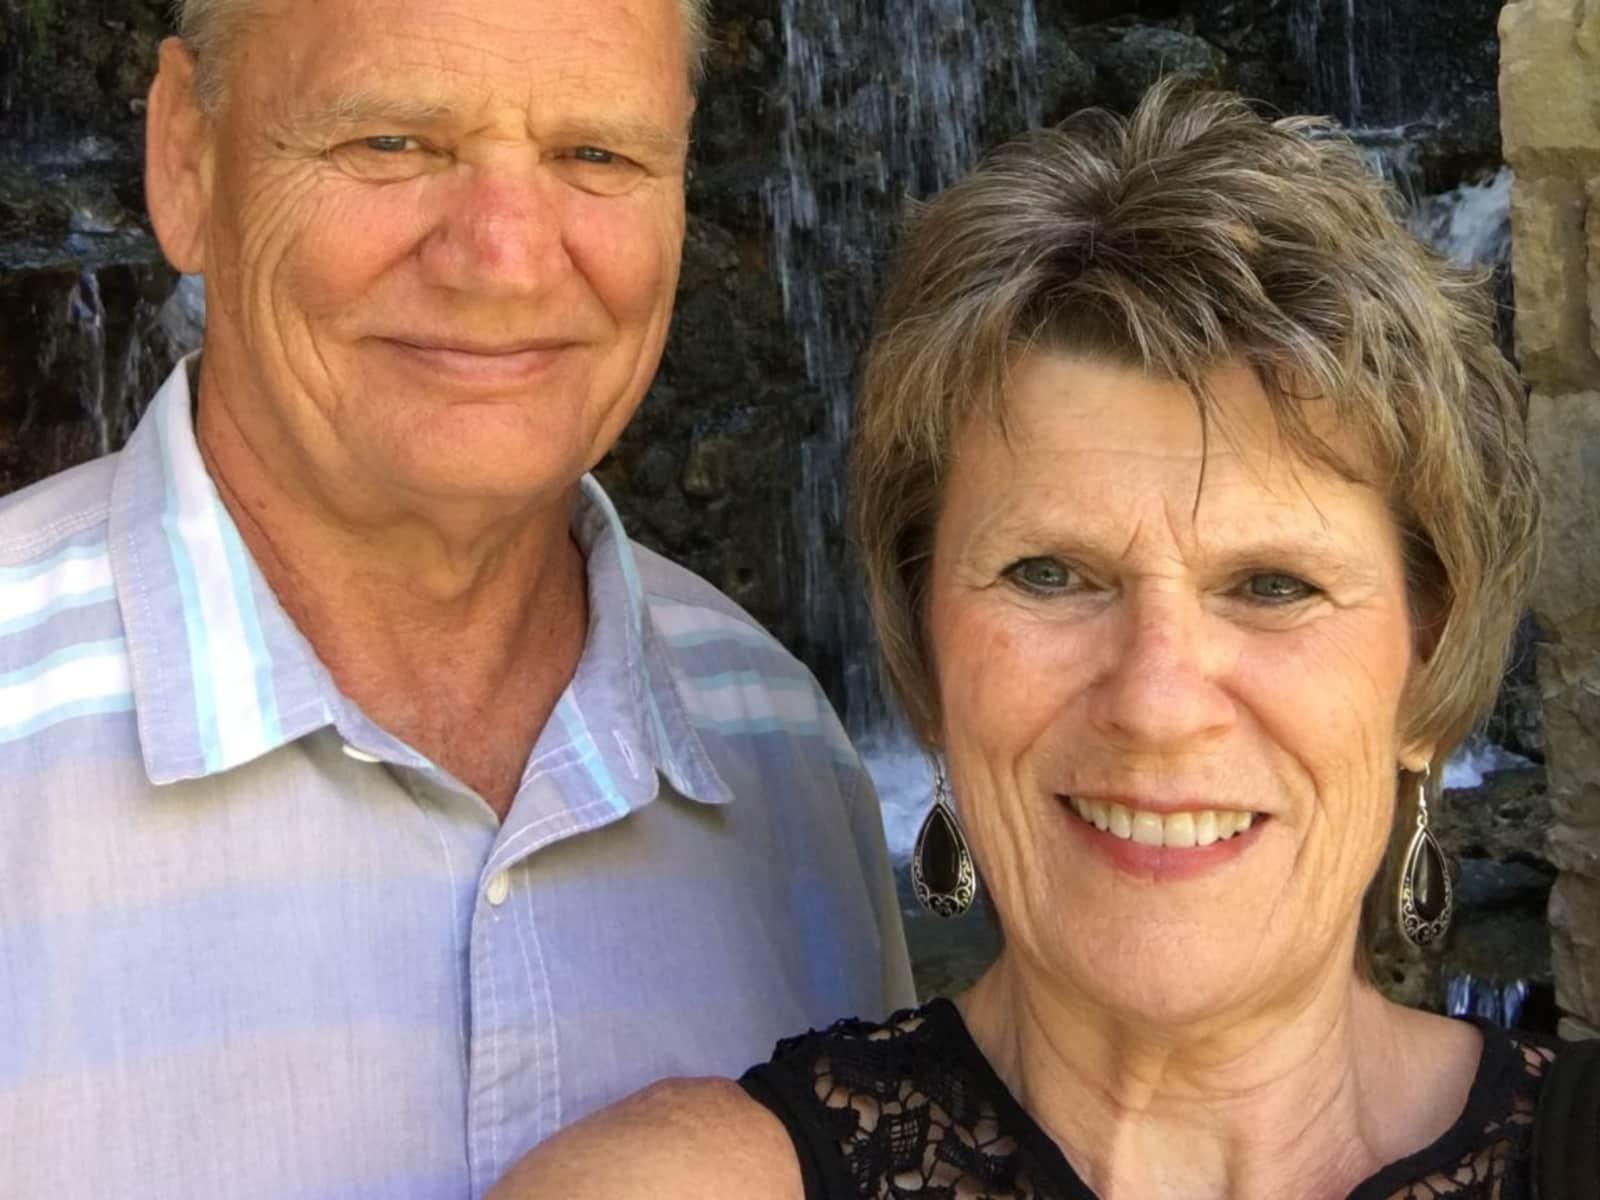 Janet & Larry from Edmond, Oklahoma, United States